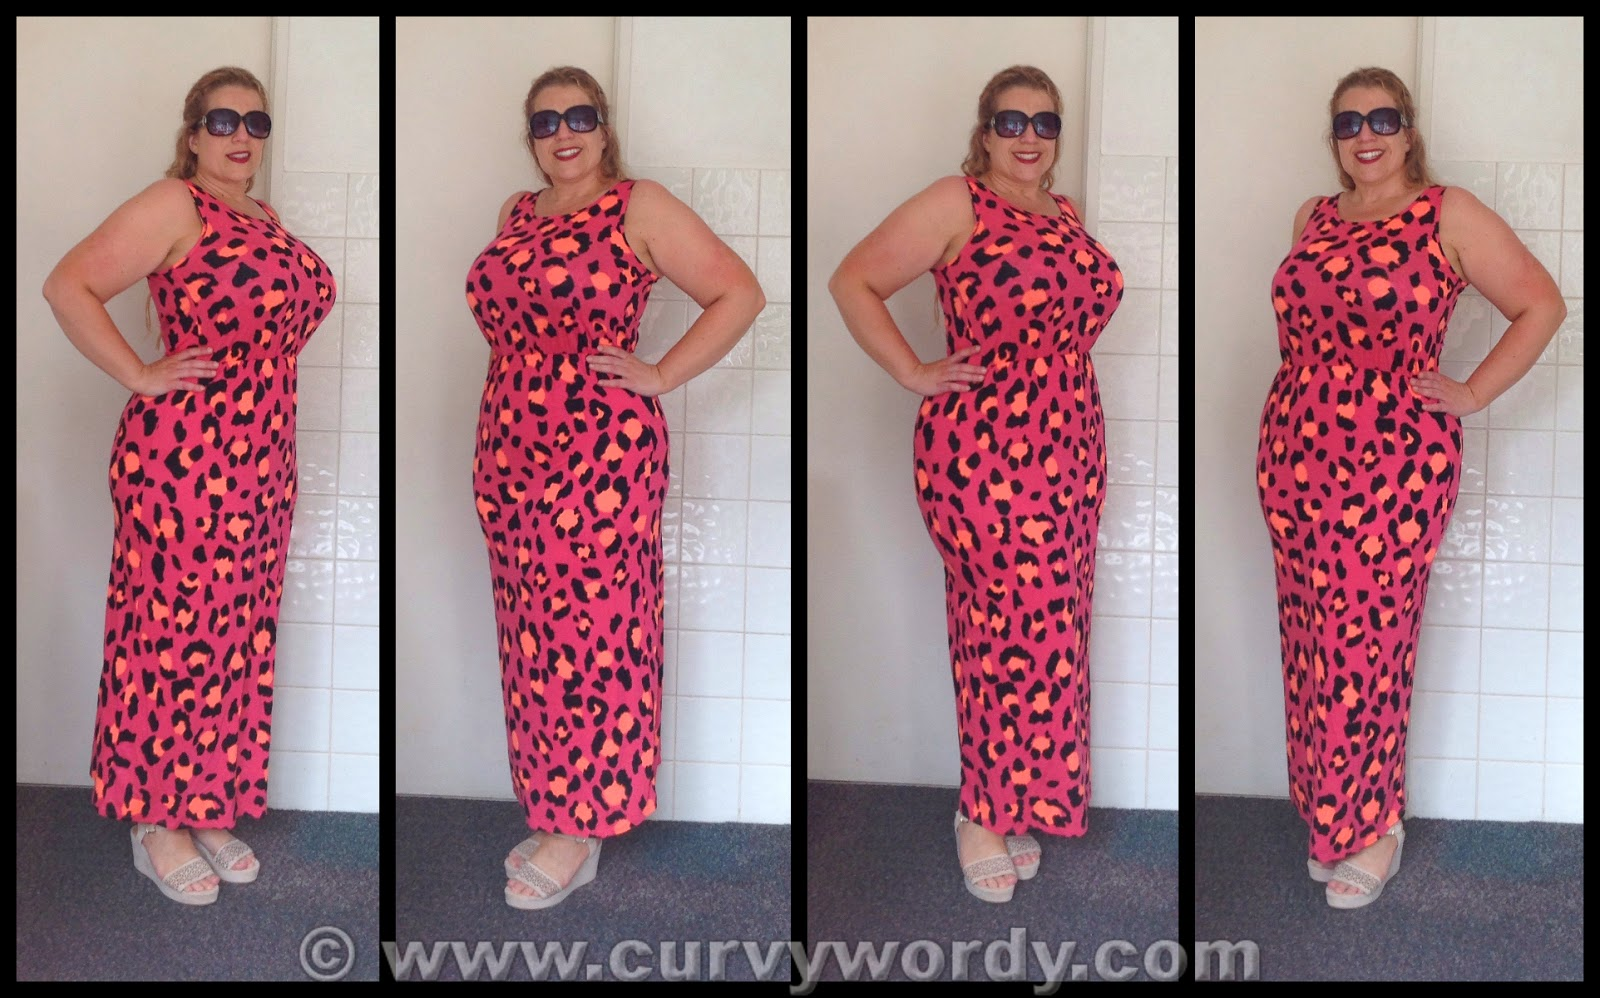 Black sandals asda i had seen the leopard print maxi dress 14 00 sizes 8